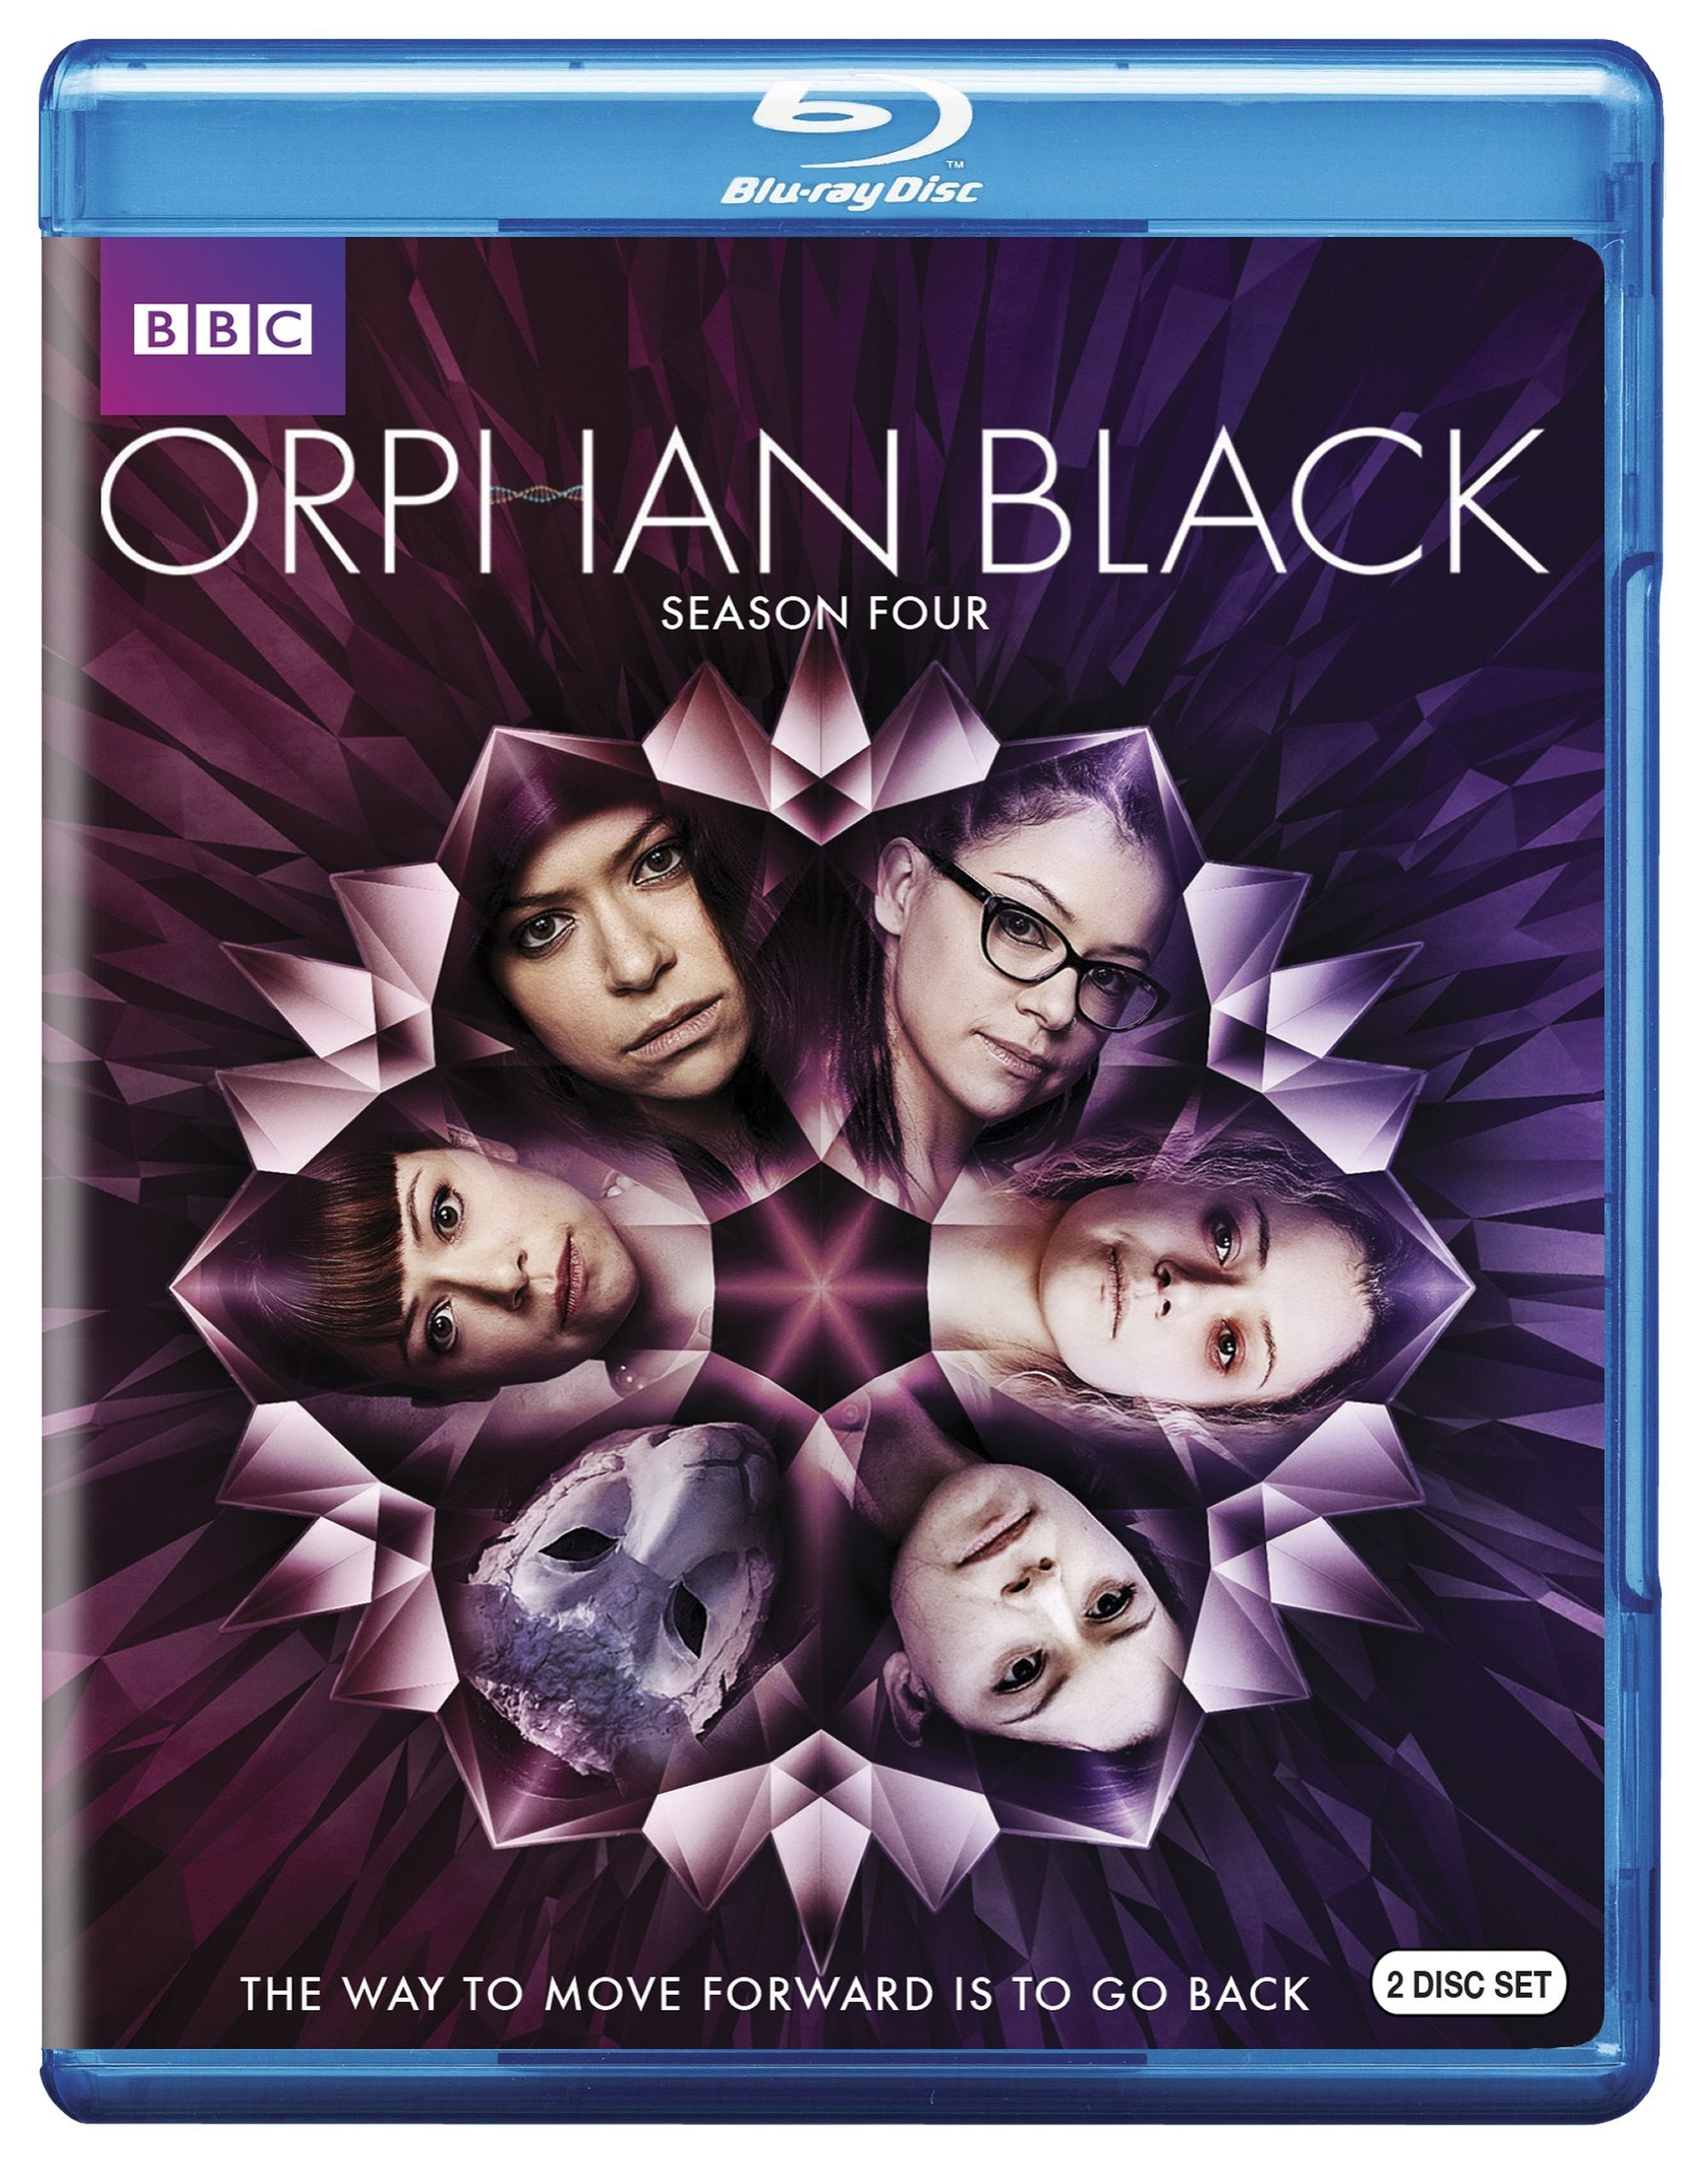 Blu-ray : Orphan Black: Season 4 (2 Disc)